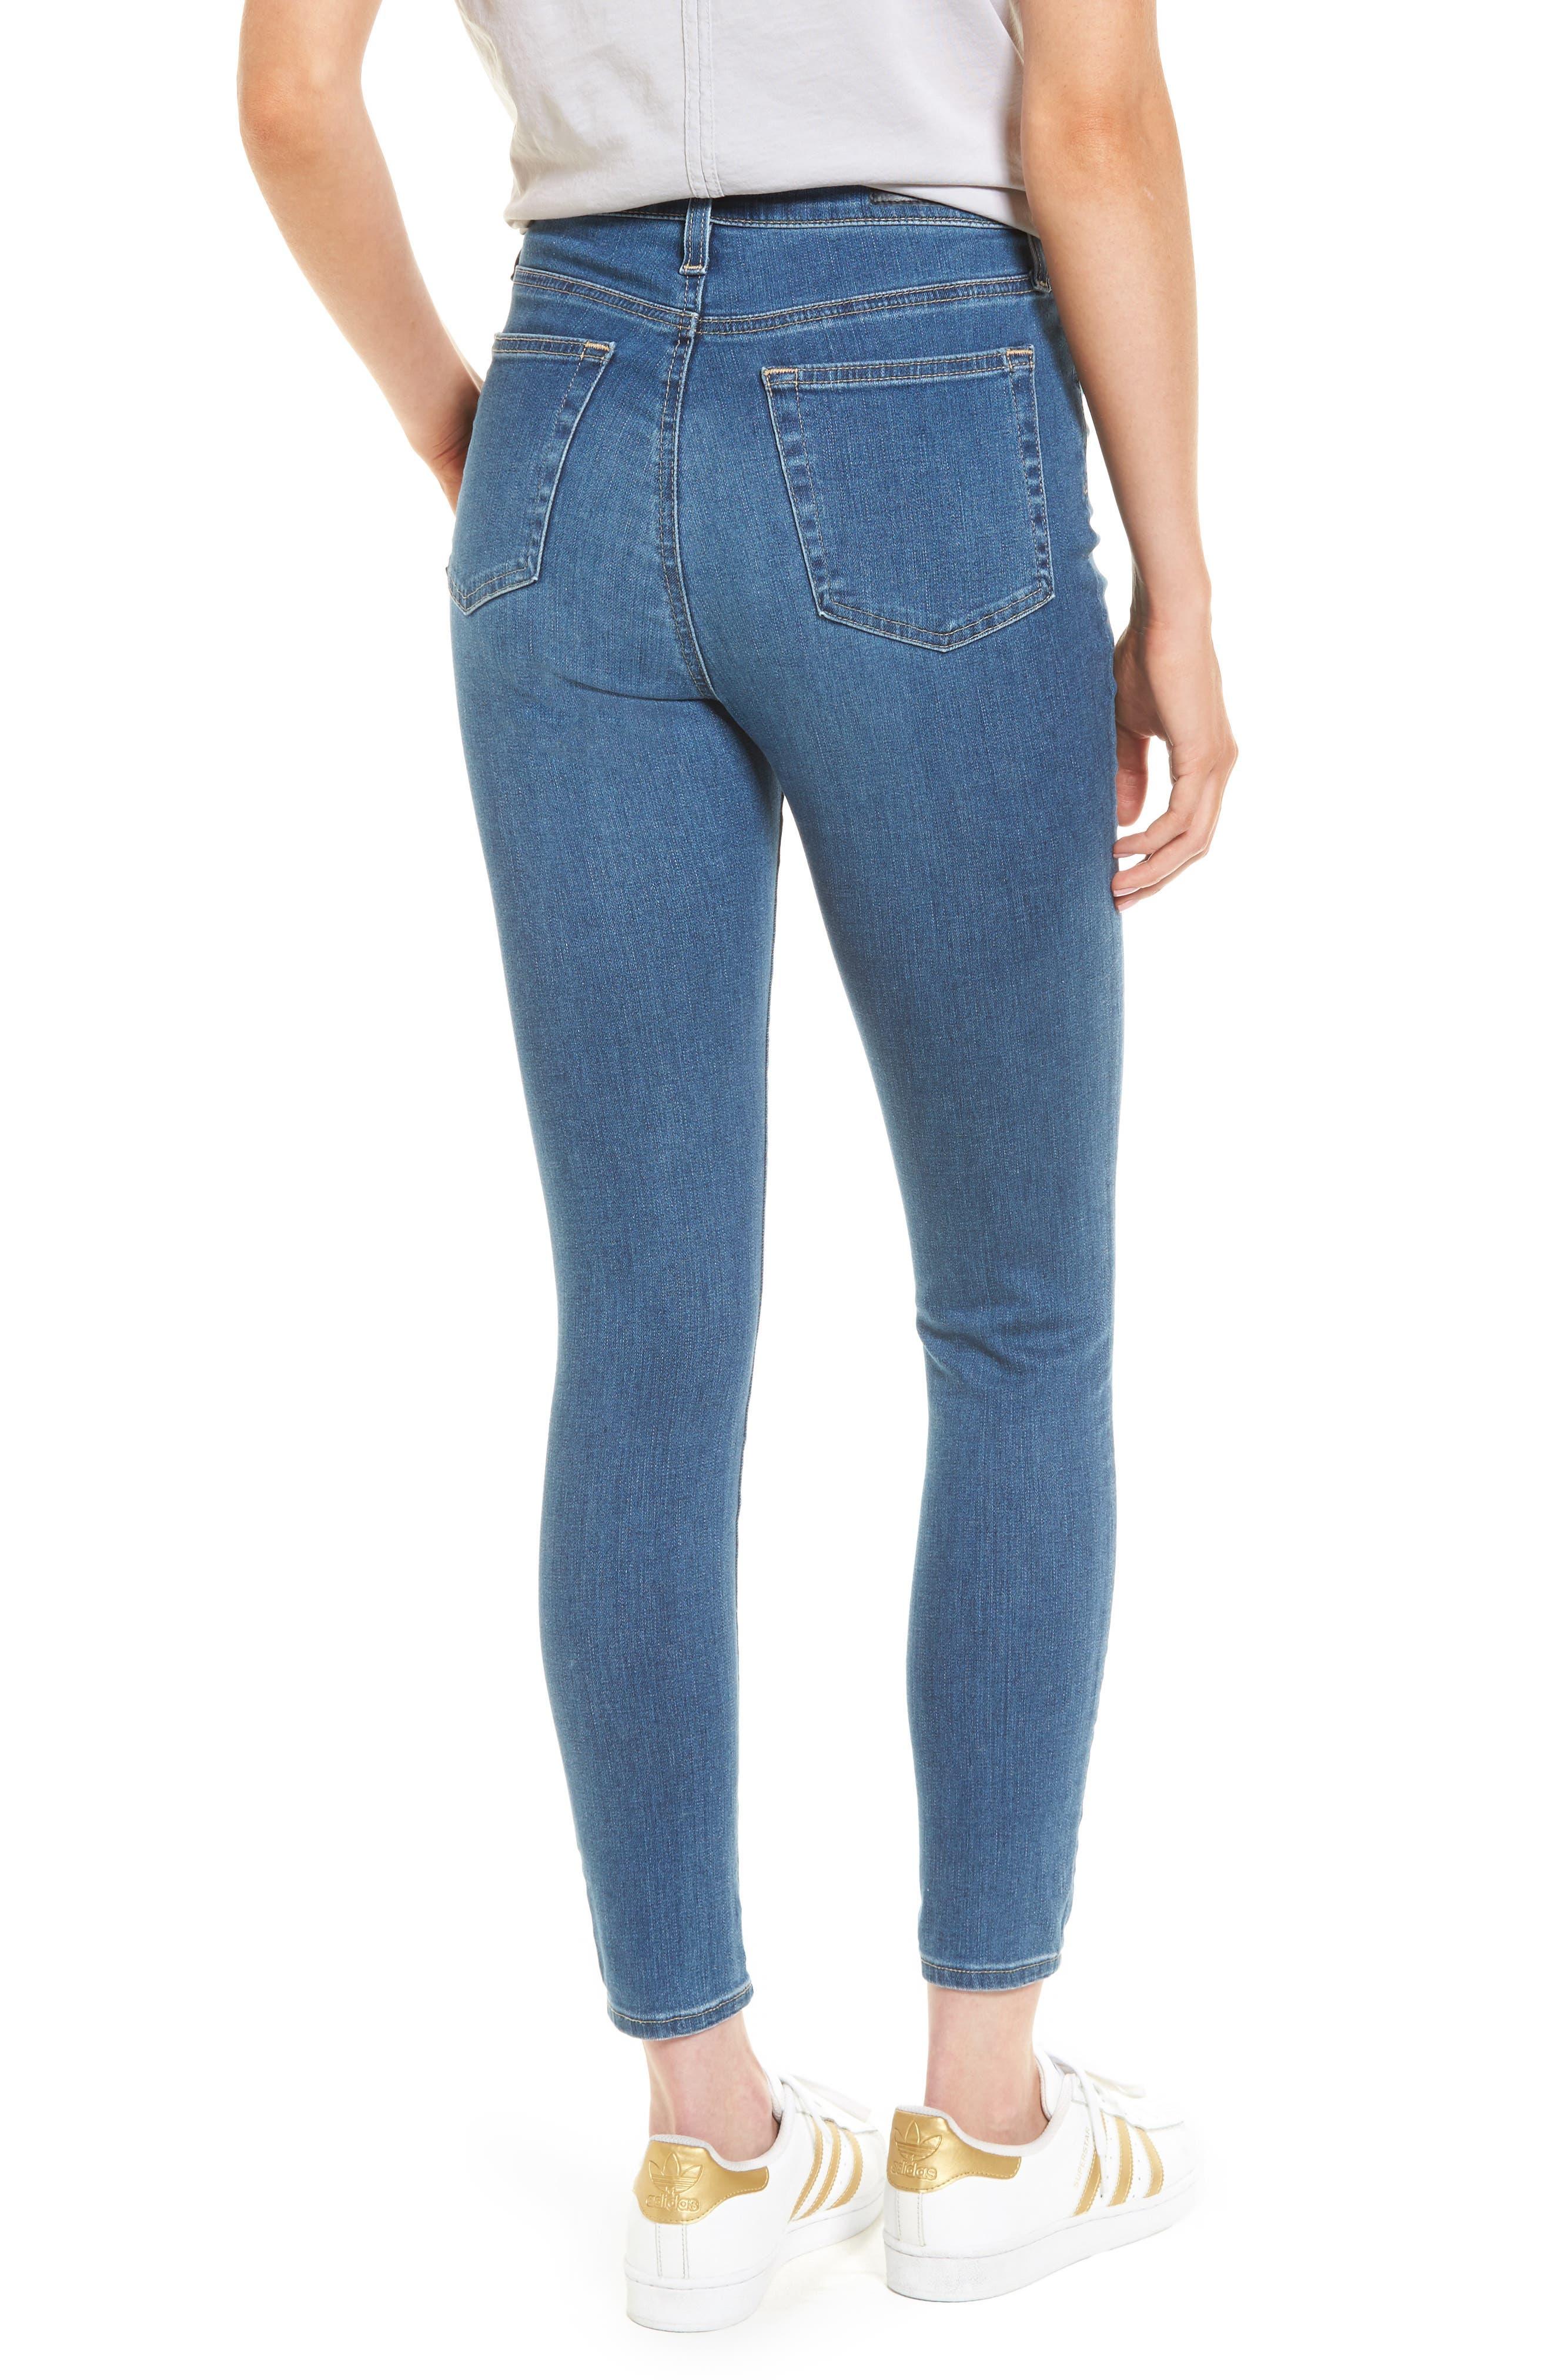 Mila High Waist Ankle Skinny Jeans,                             Alternate thumbnail 2, color,                             Indigo Viking